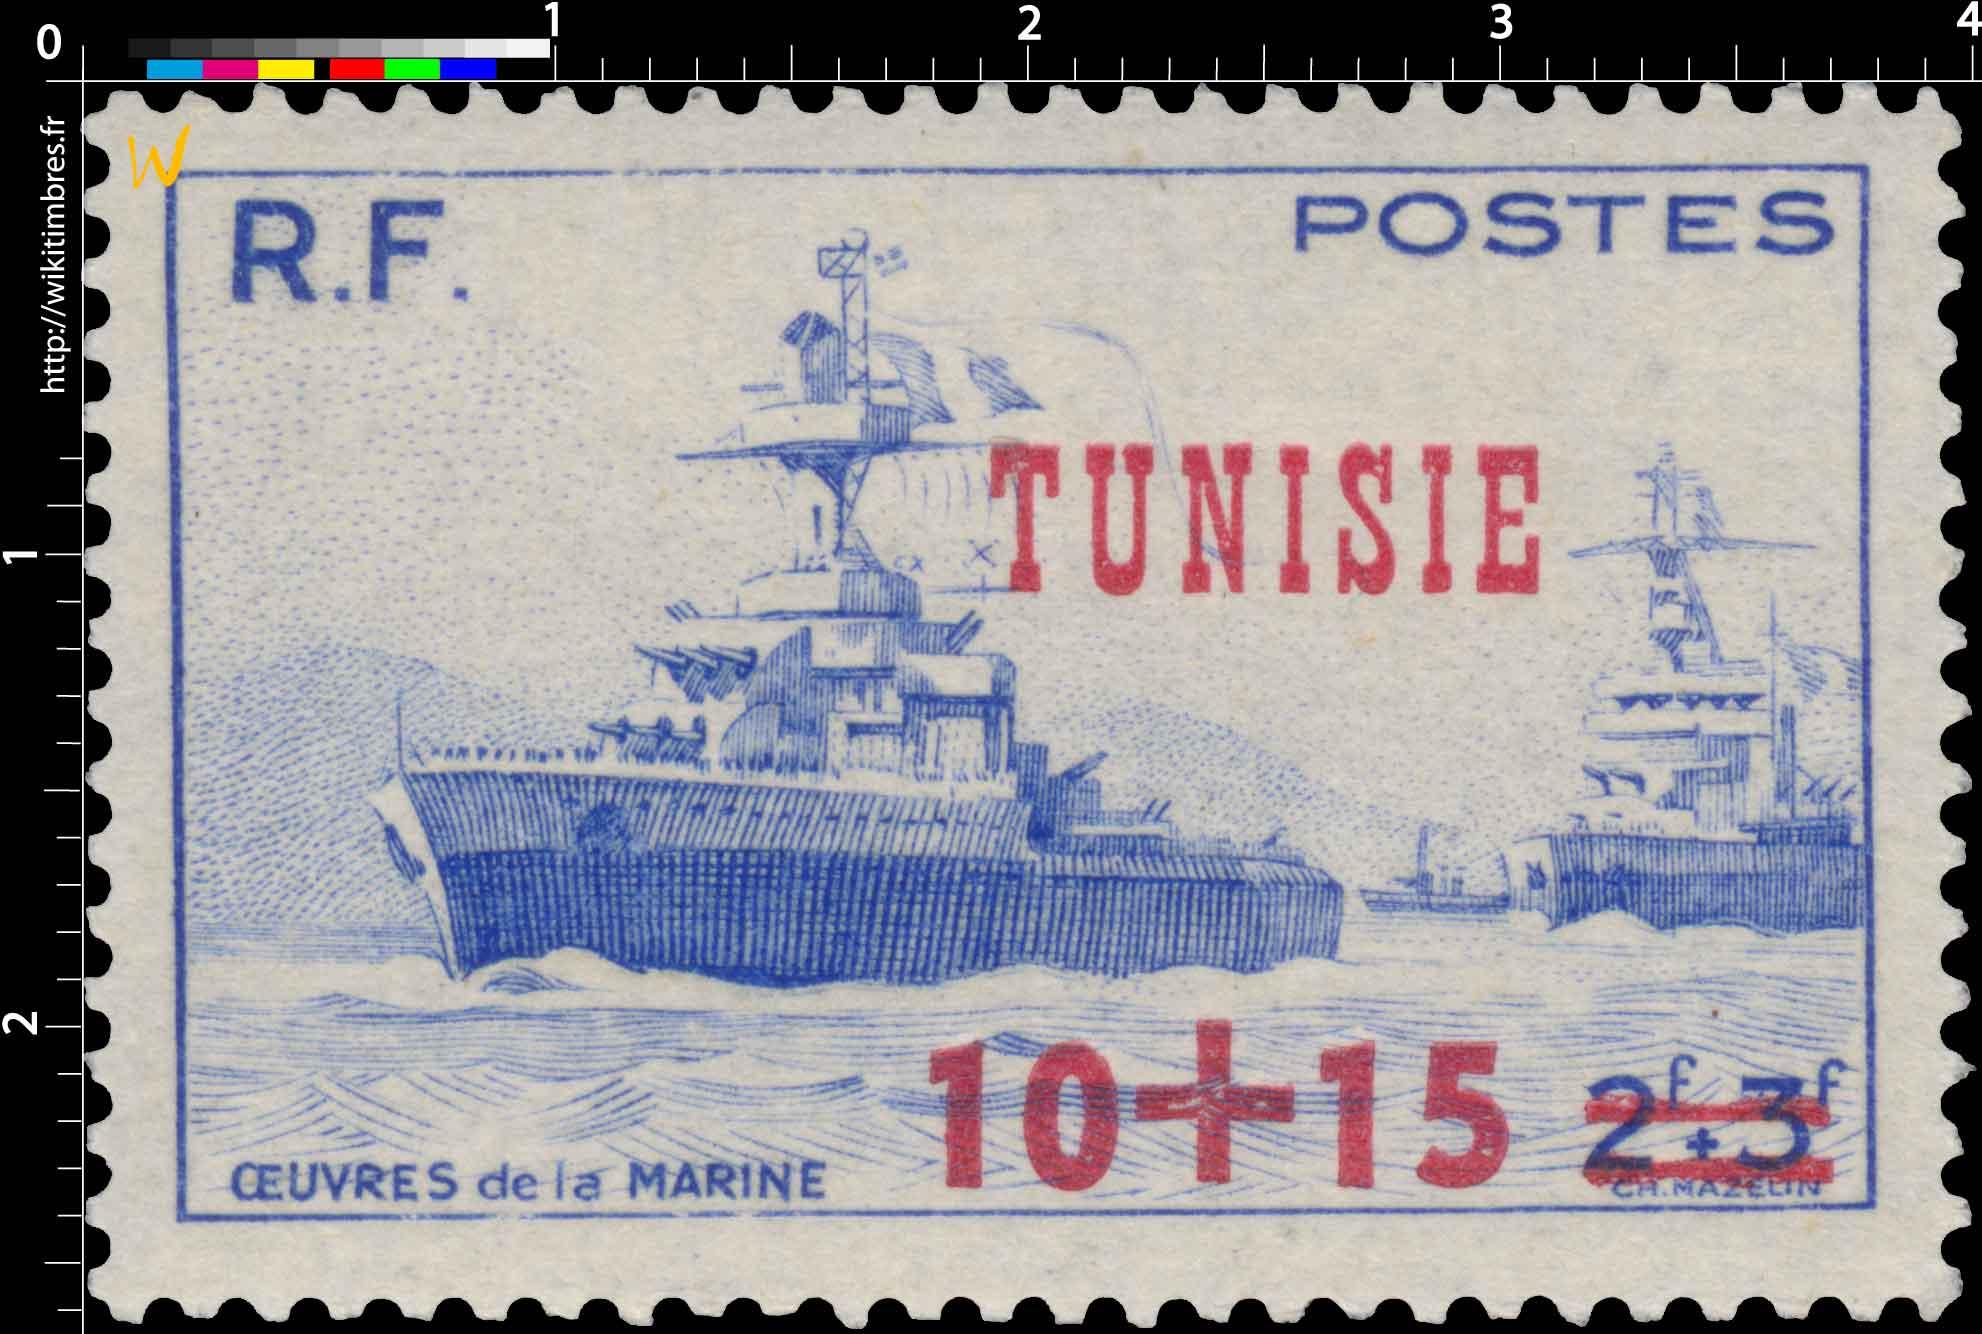 Tunisie - Oeuvres de la marine